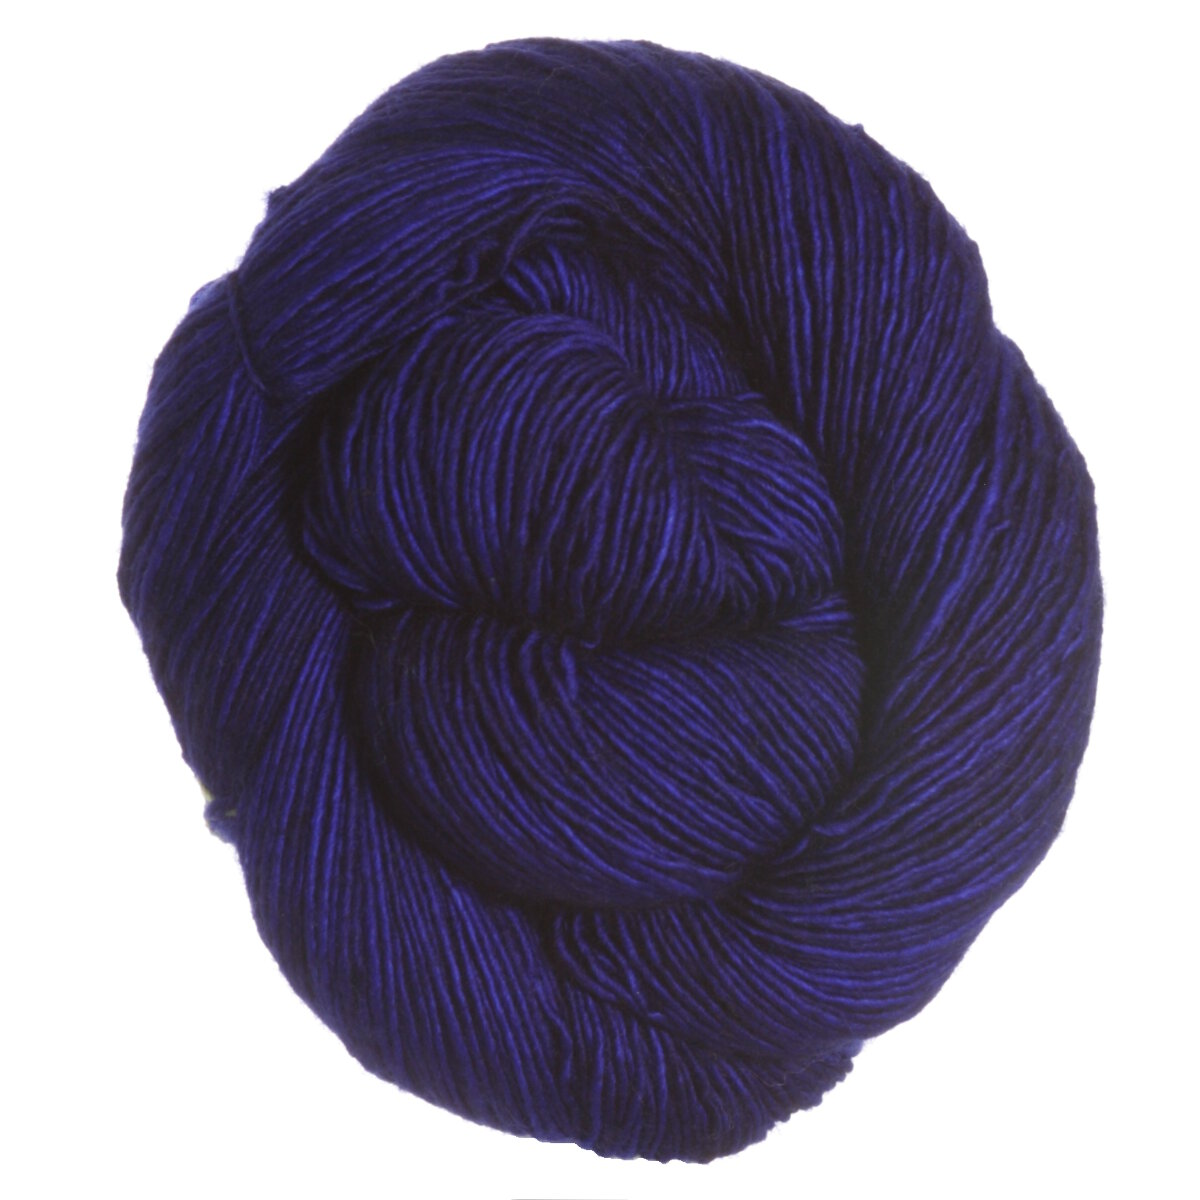 madelinetosh tosh merino light yarn fathom at jimmy. Black Bedroom Furniture Sets. Home Design Ideas